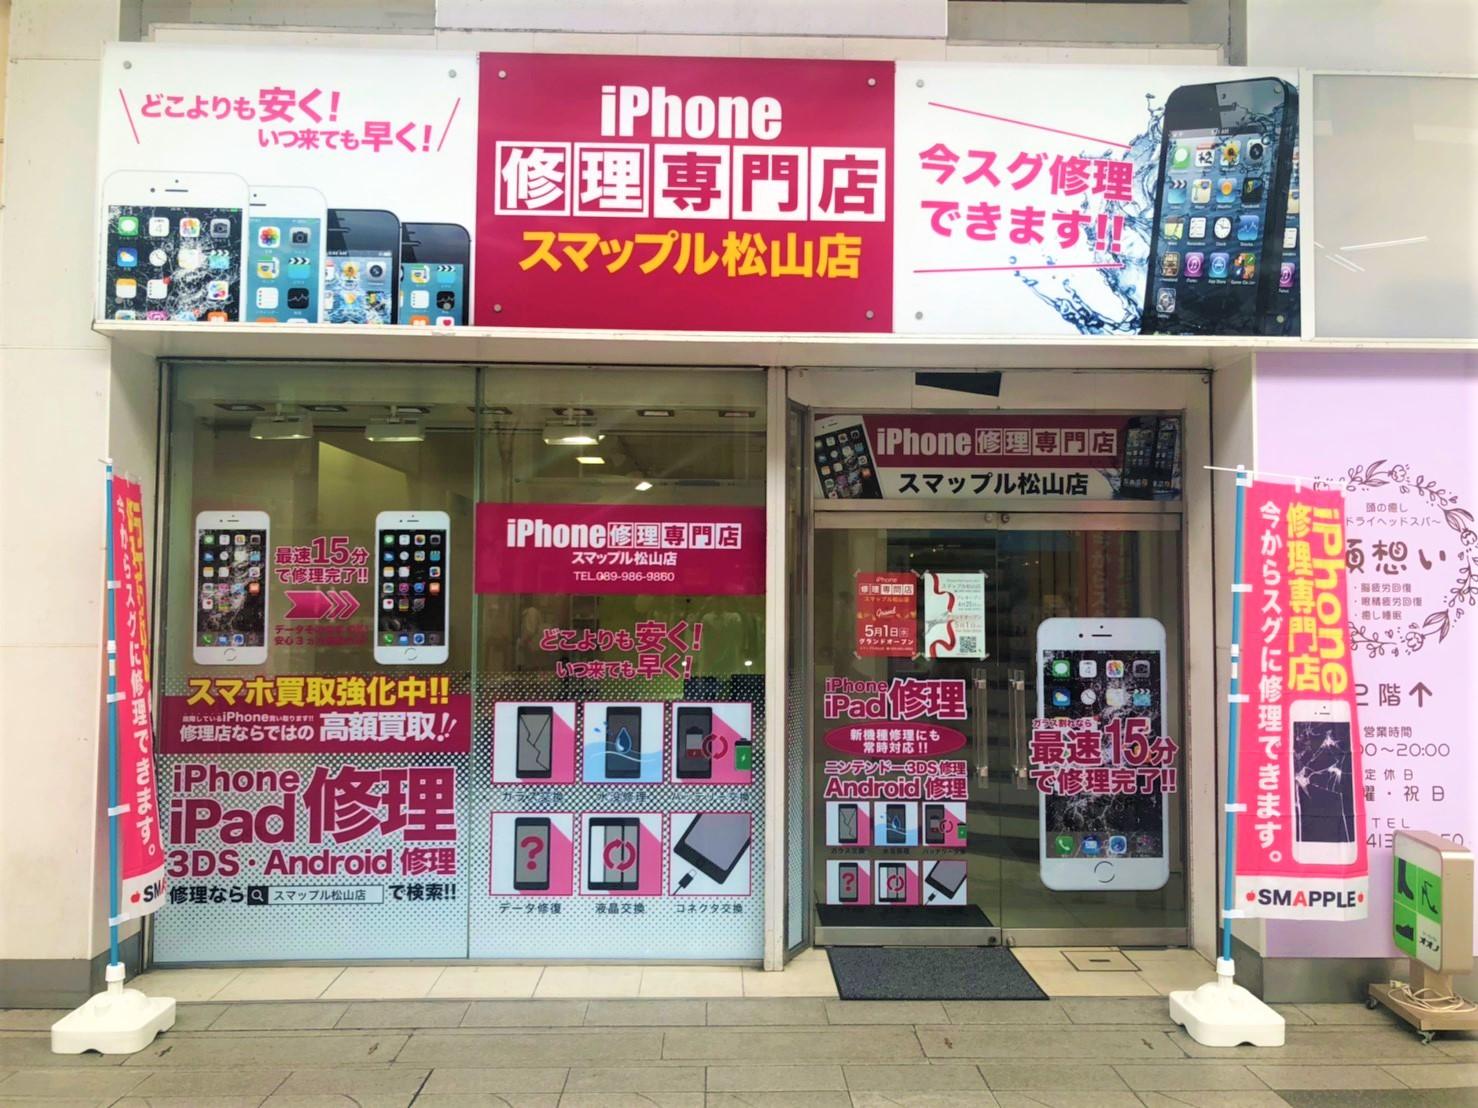 iPhone修理 スマップル松山店